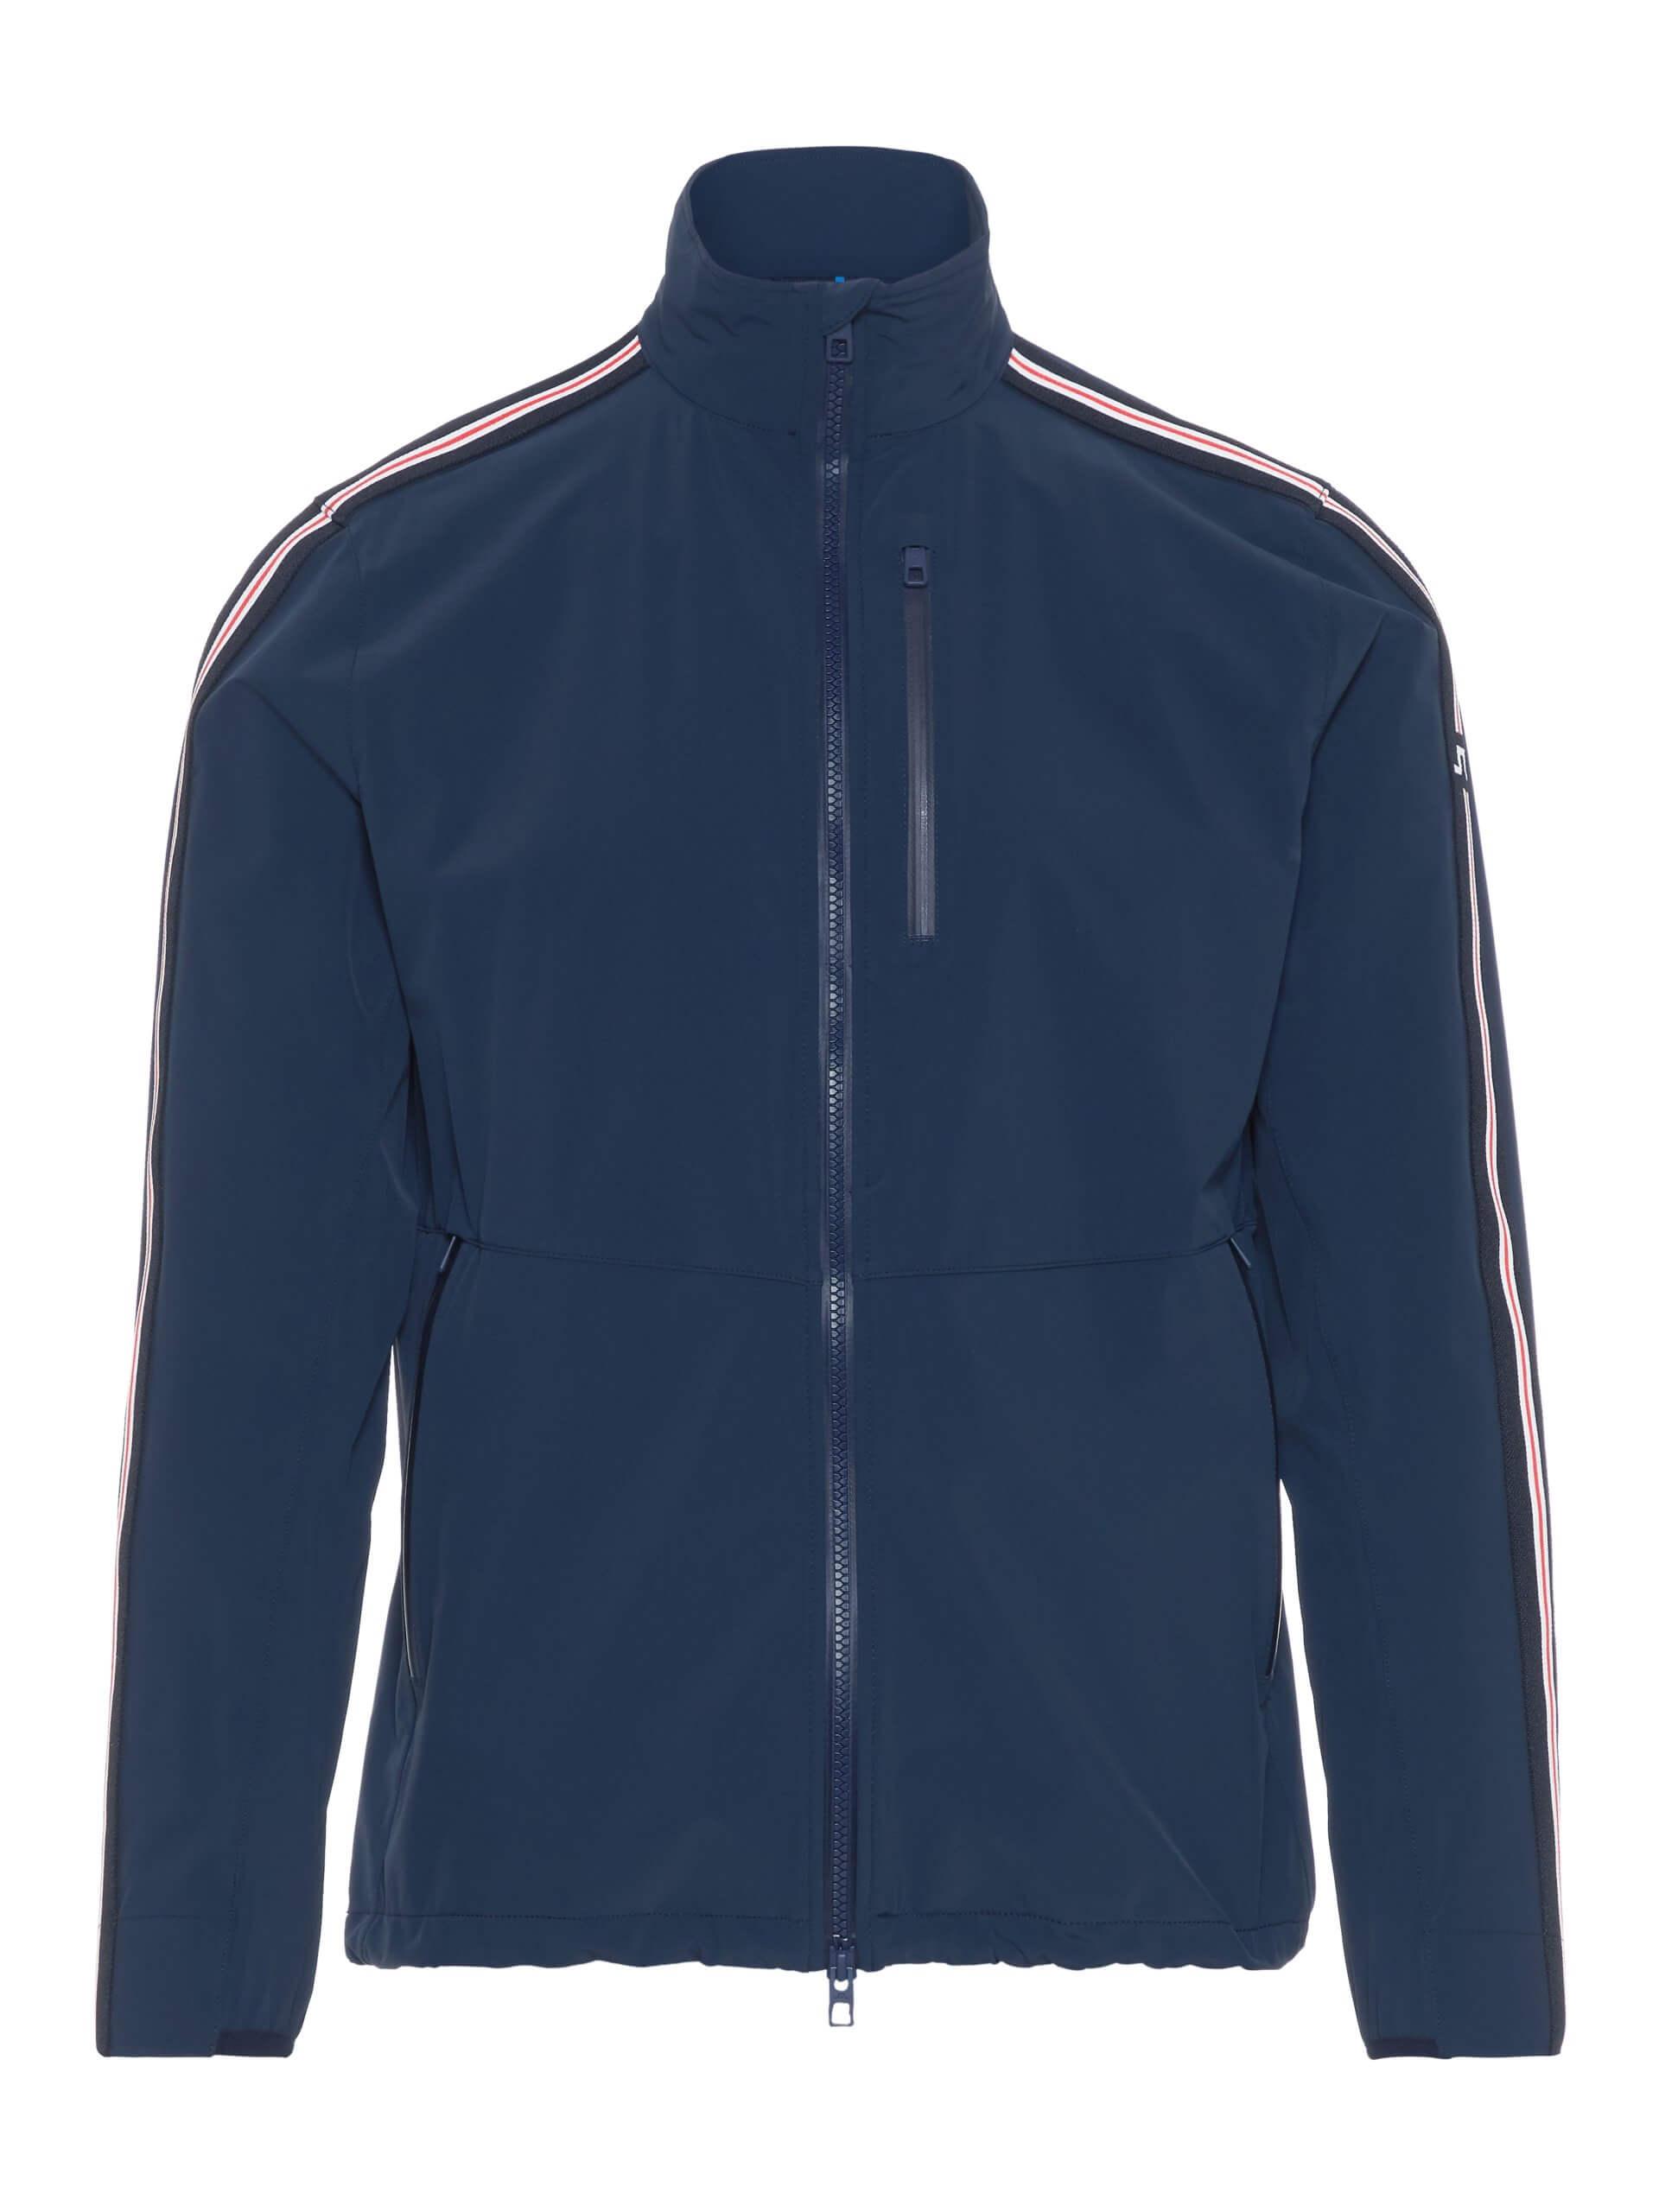 J.Lindeberg - Adapt Stripe Jacket in navy